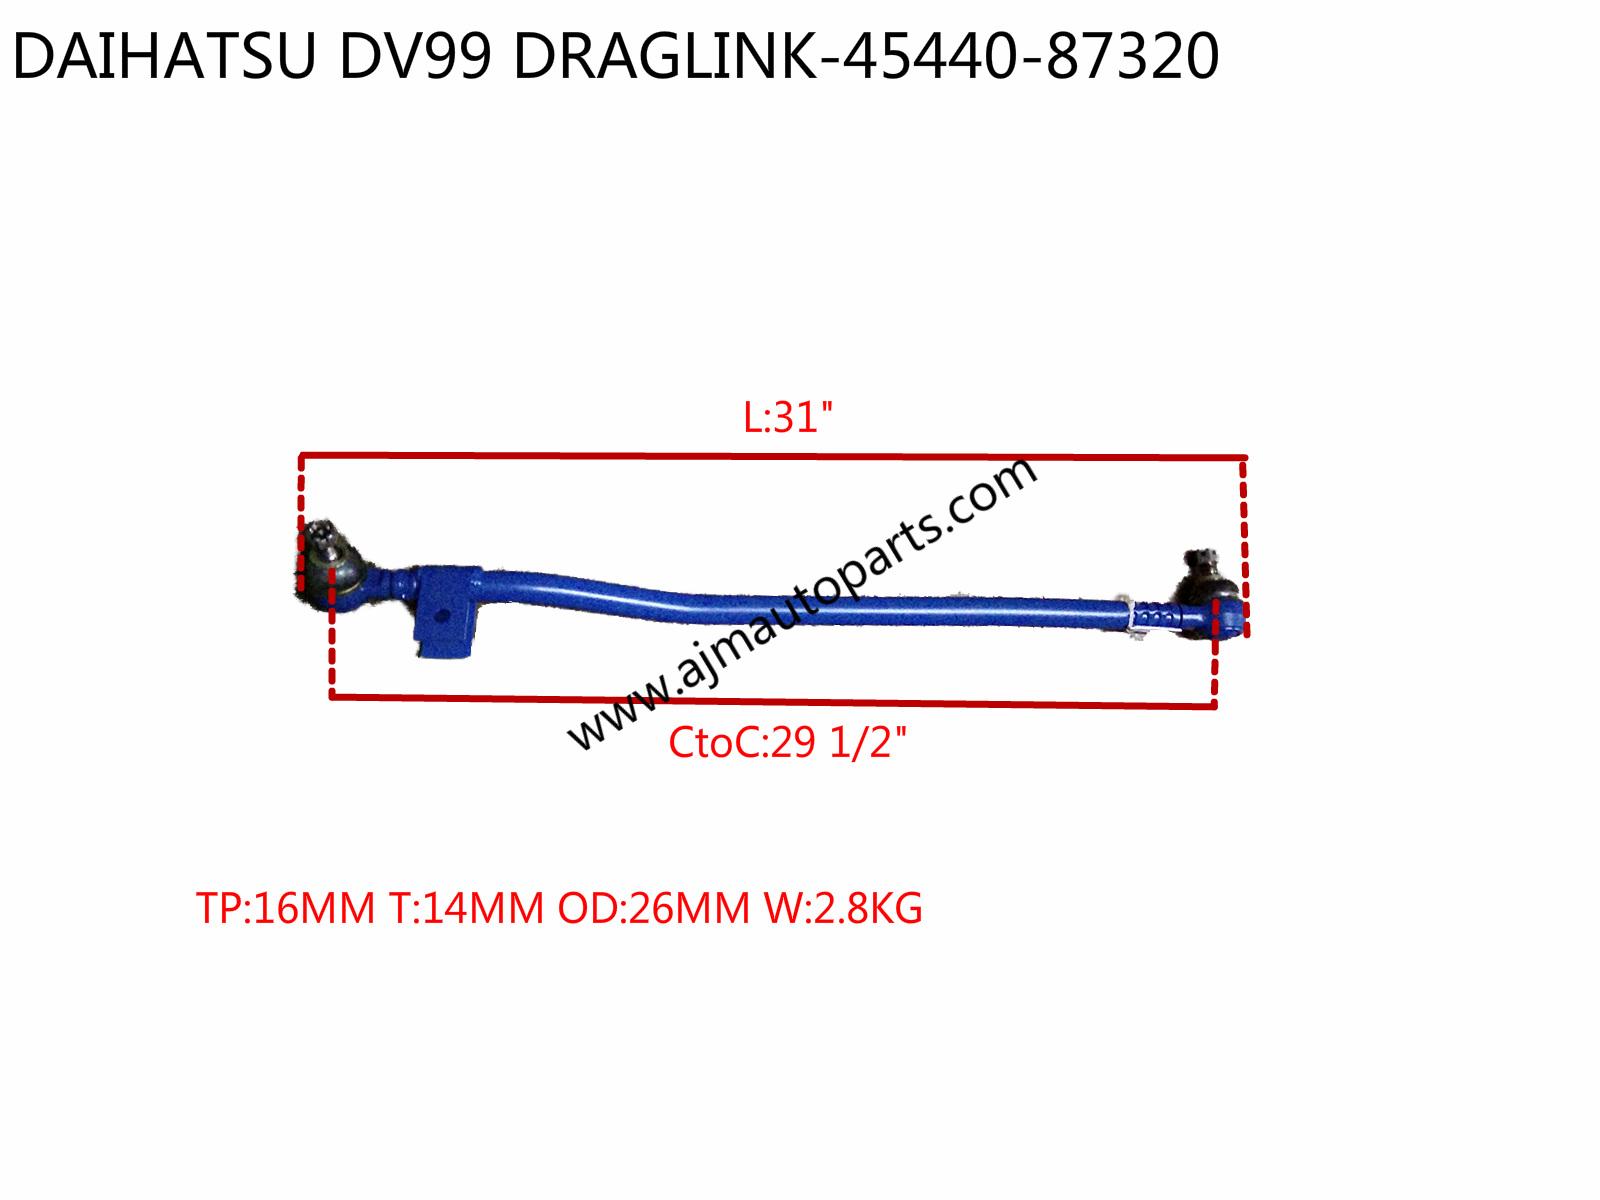 DAIHATSU DV99 DRAGLINK-45440-87324